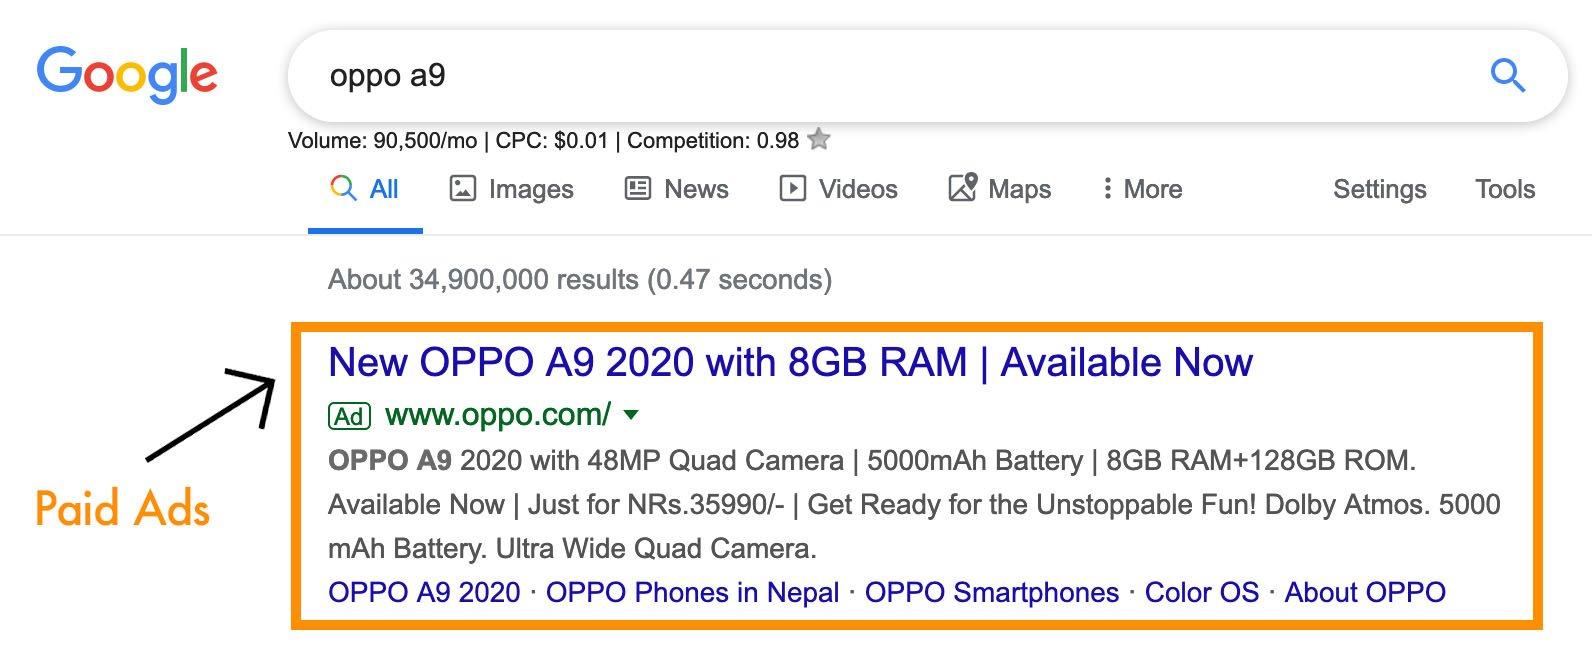 Paid Ads on Google